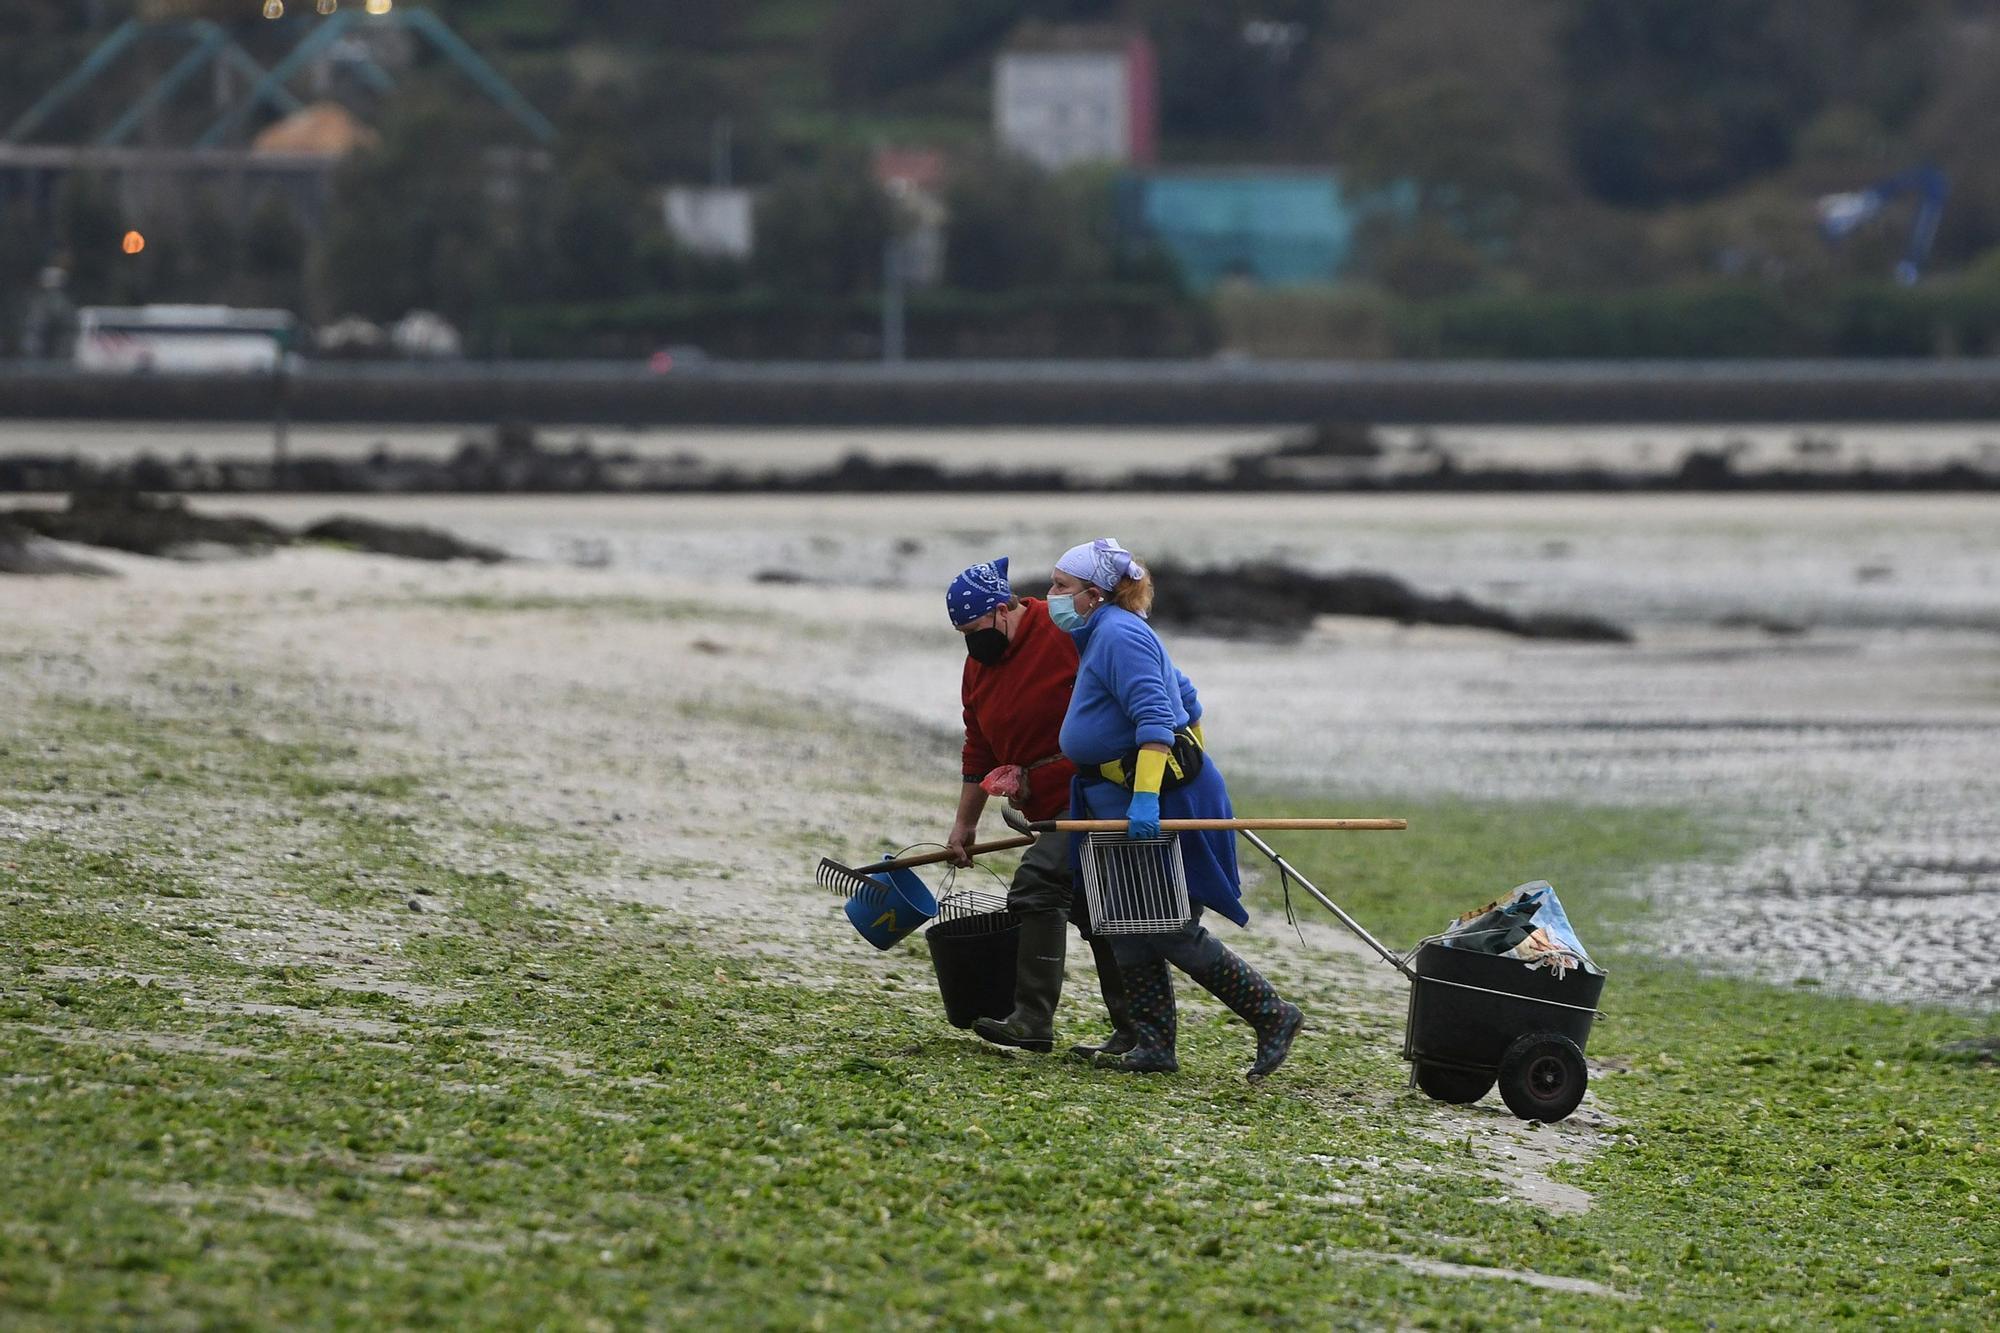 Las mariscadoras vuelven a faenar